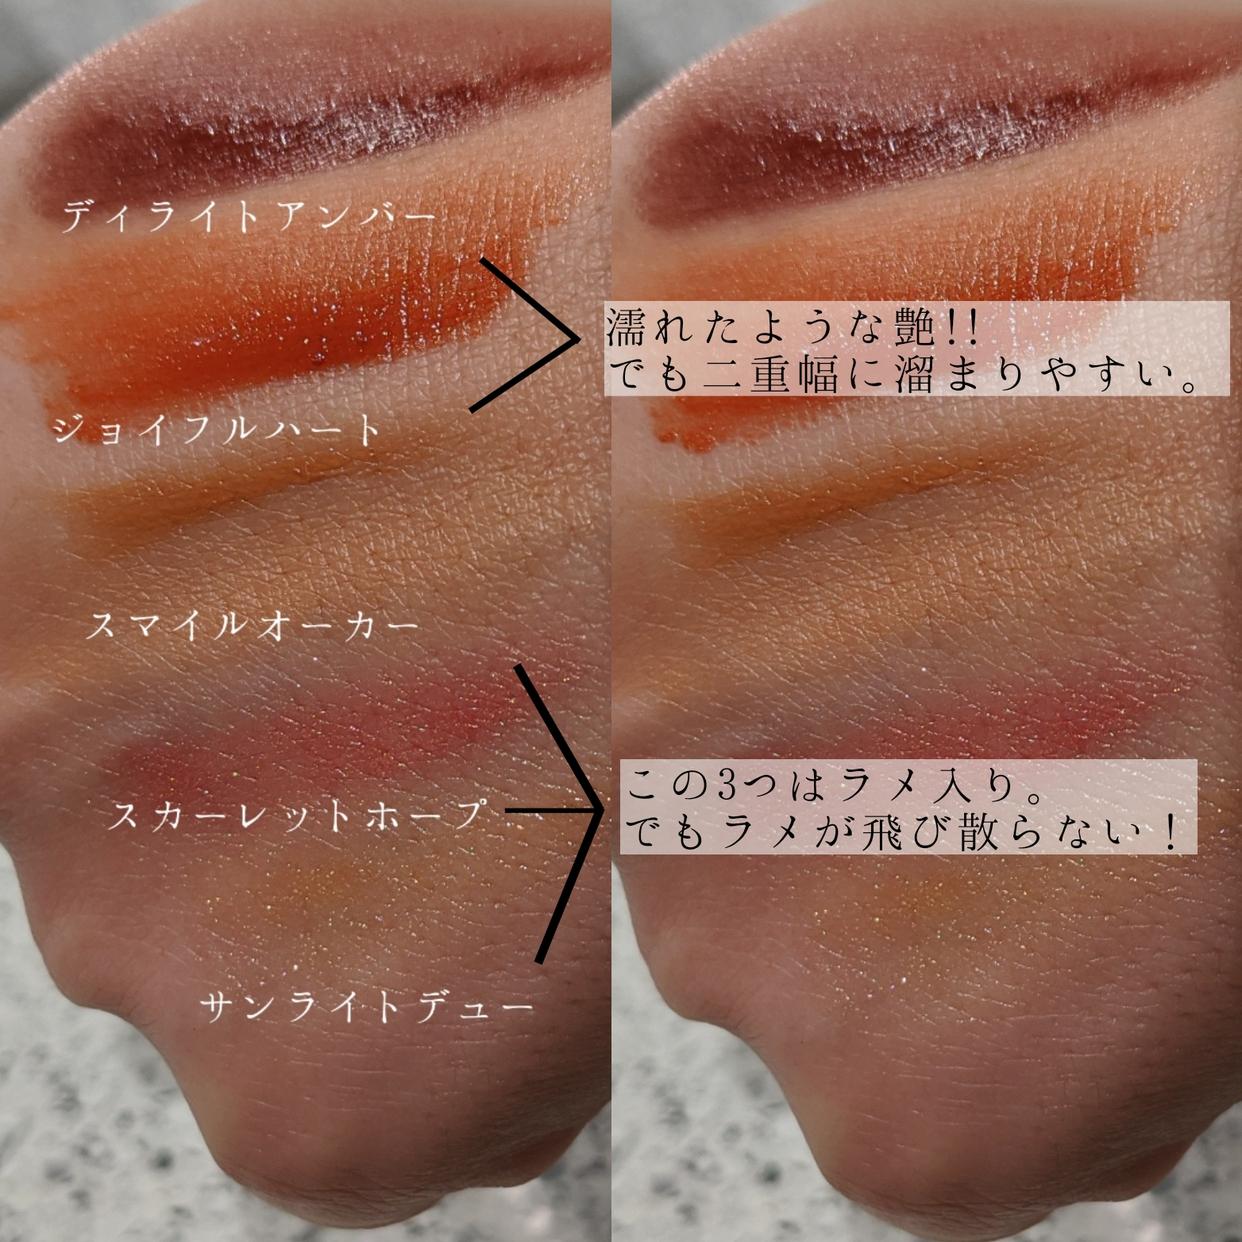 SHIRO(シロ) ジンジャーアイシャドウグロウを使ったChimachangramさんのクチコミ画像2